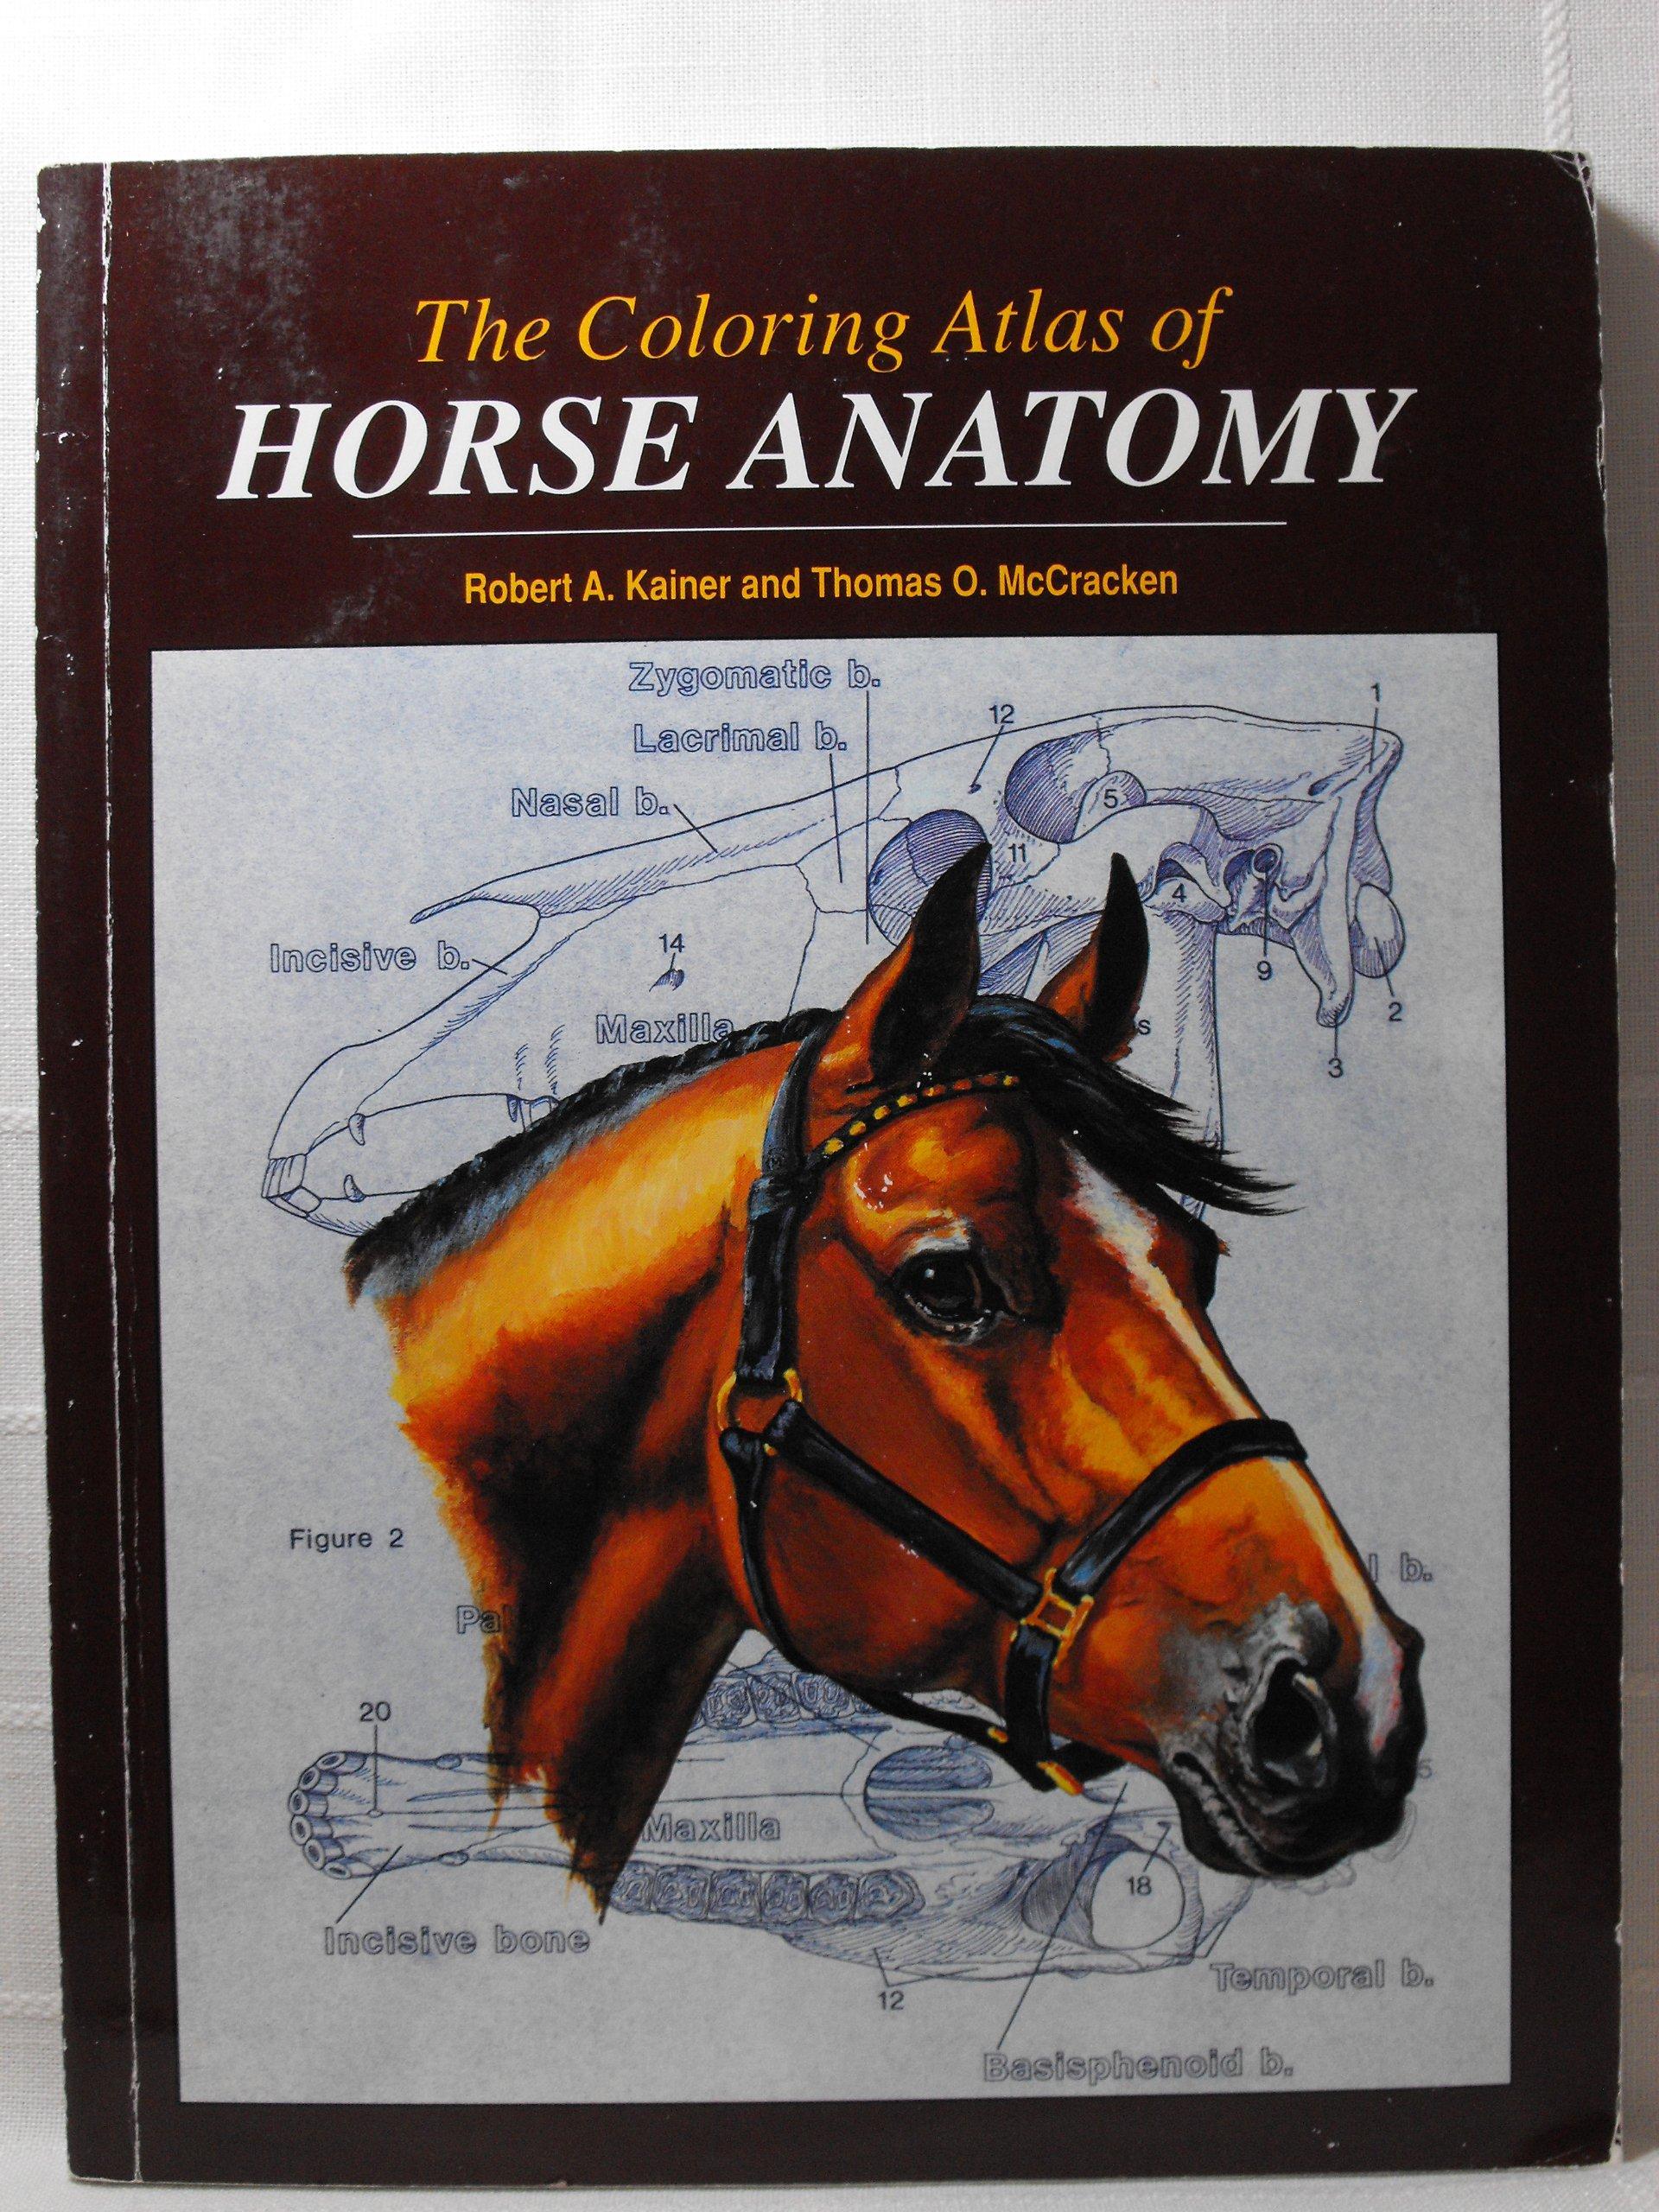 Coloring Atlas of Horse Anatomy: Robert Kainer, Thomas McCracken ...